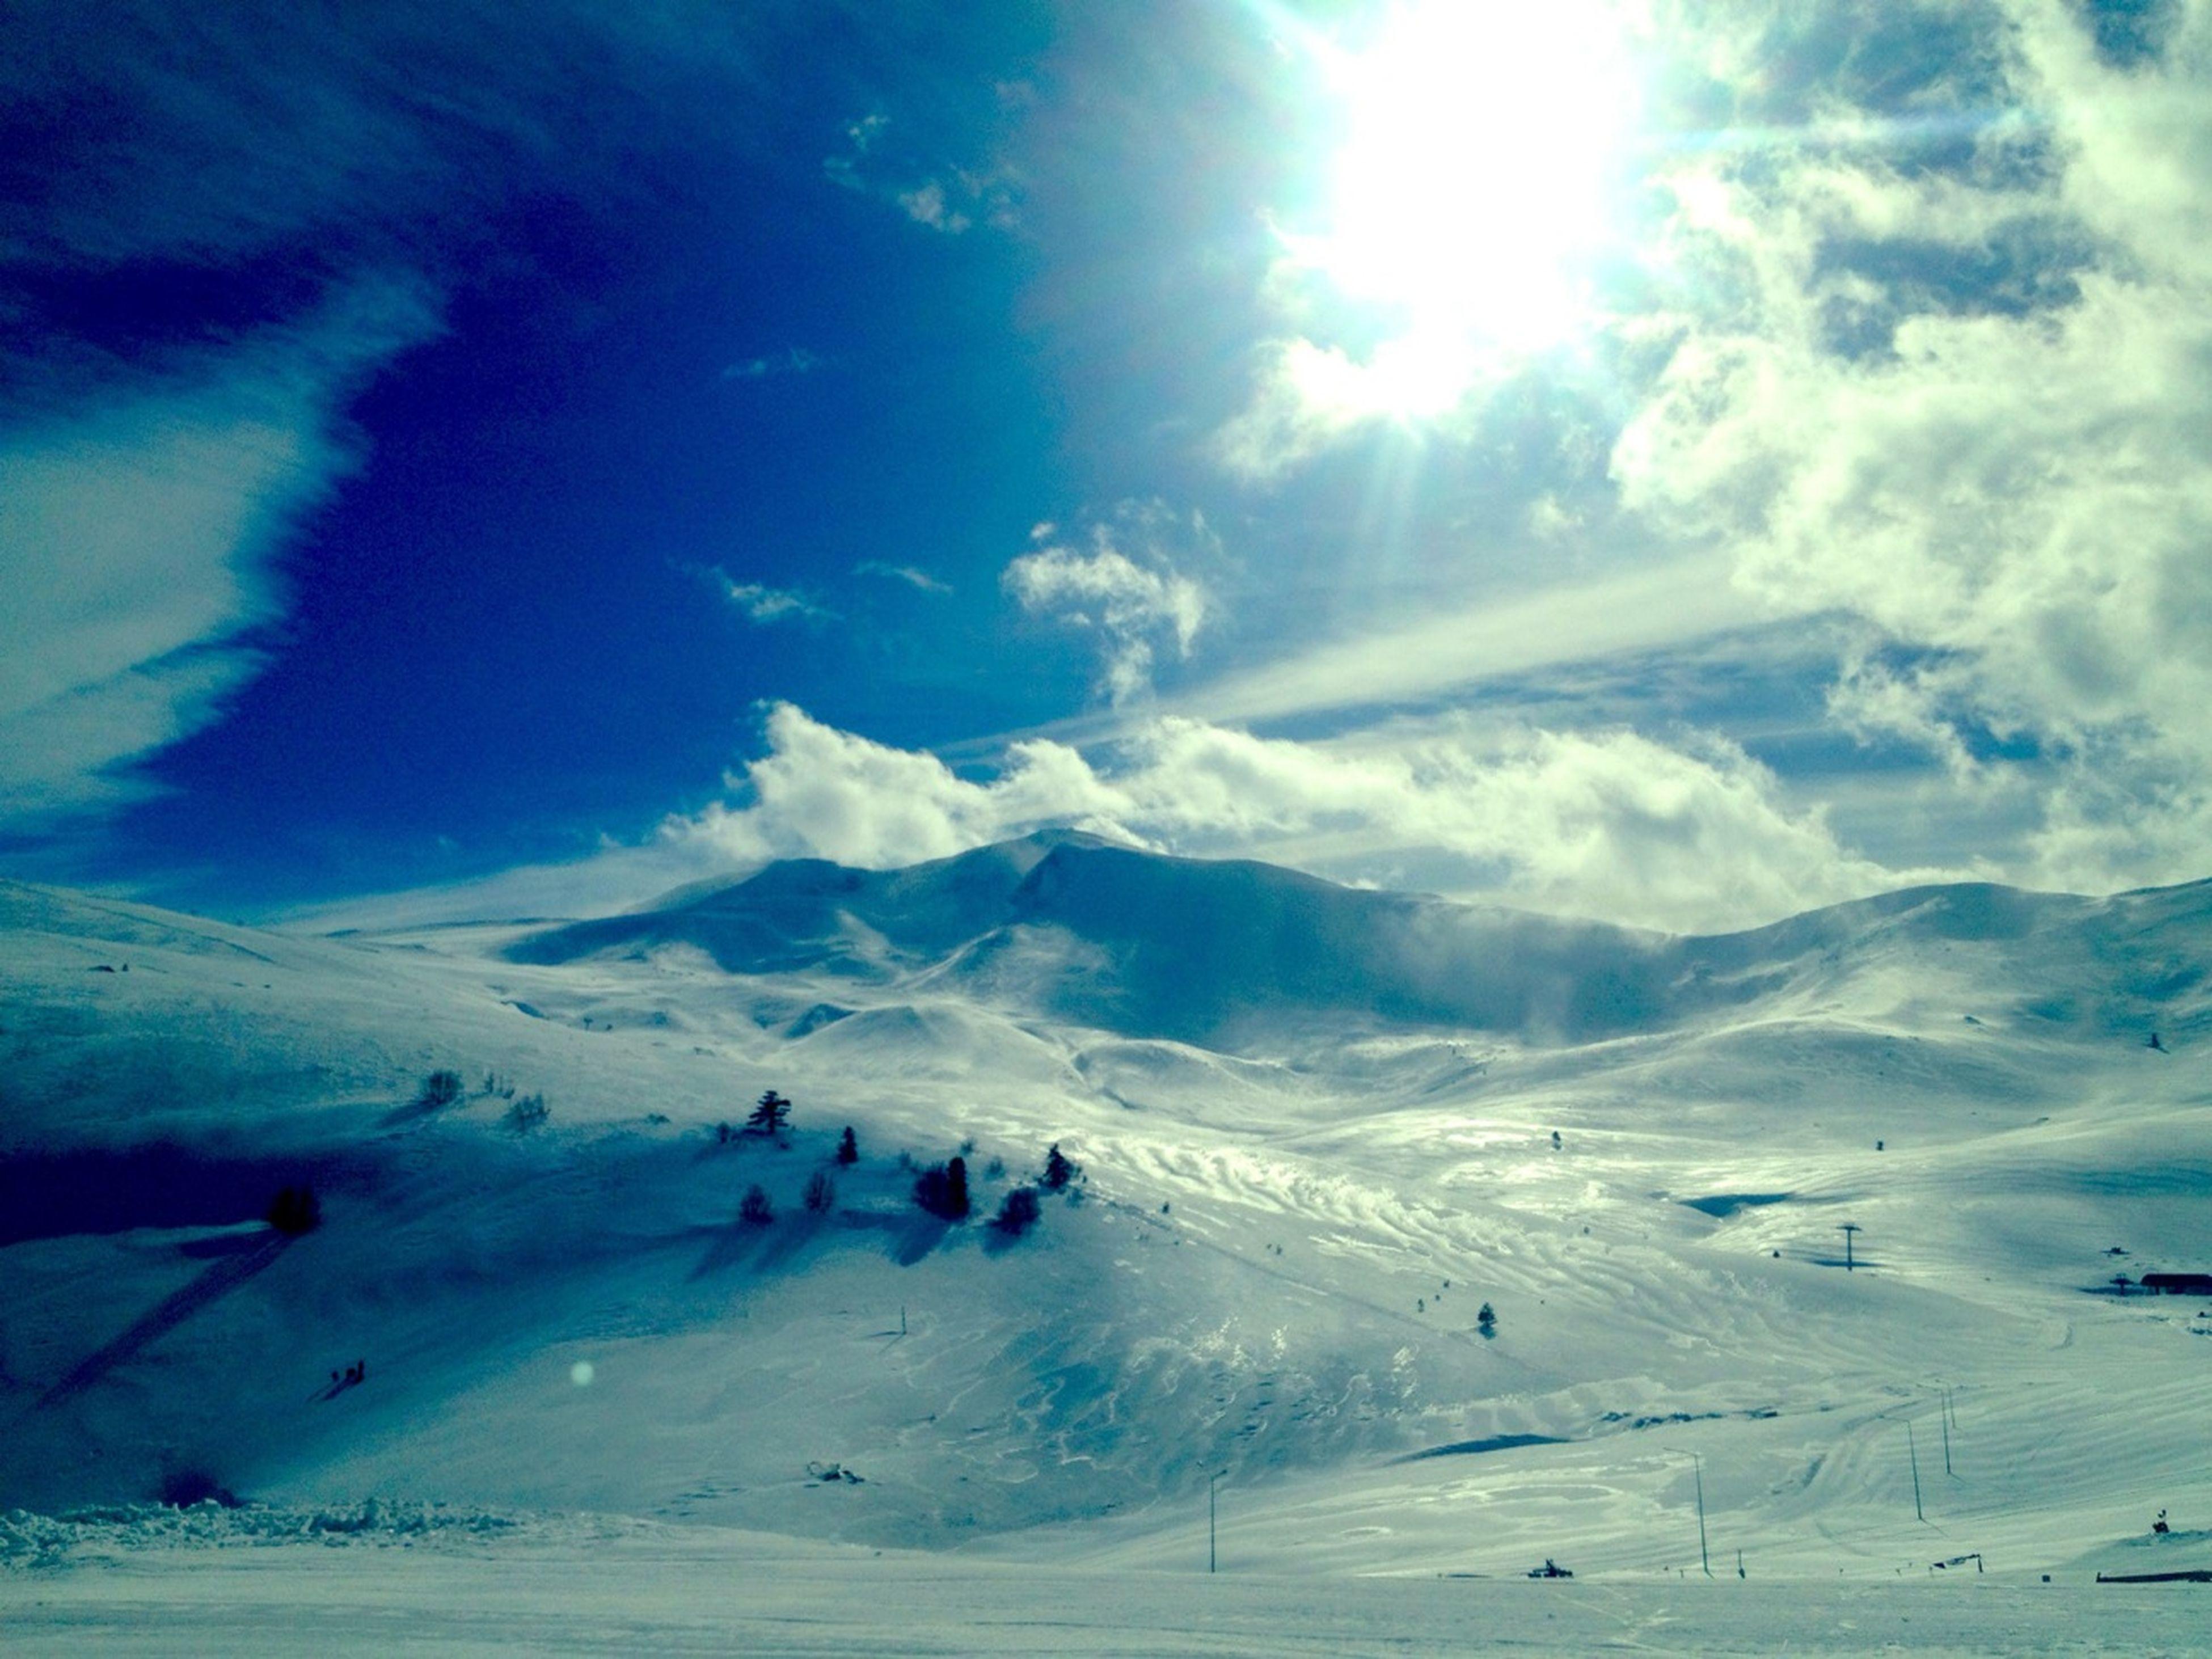 sky, snow, beauty in nature, tranquility, tranquil scene, winter, scenics, cold temperature, blue, nature, cloud - sky, landscape, sunlight, weather, mountain, cloud, day, sunbeam, sun, idyllic